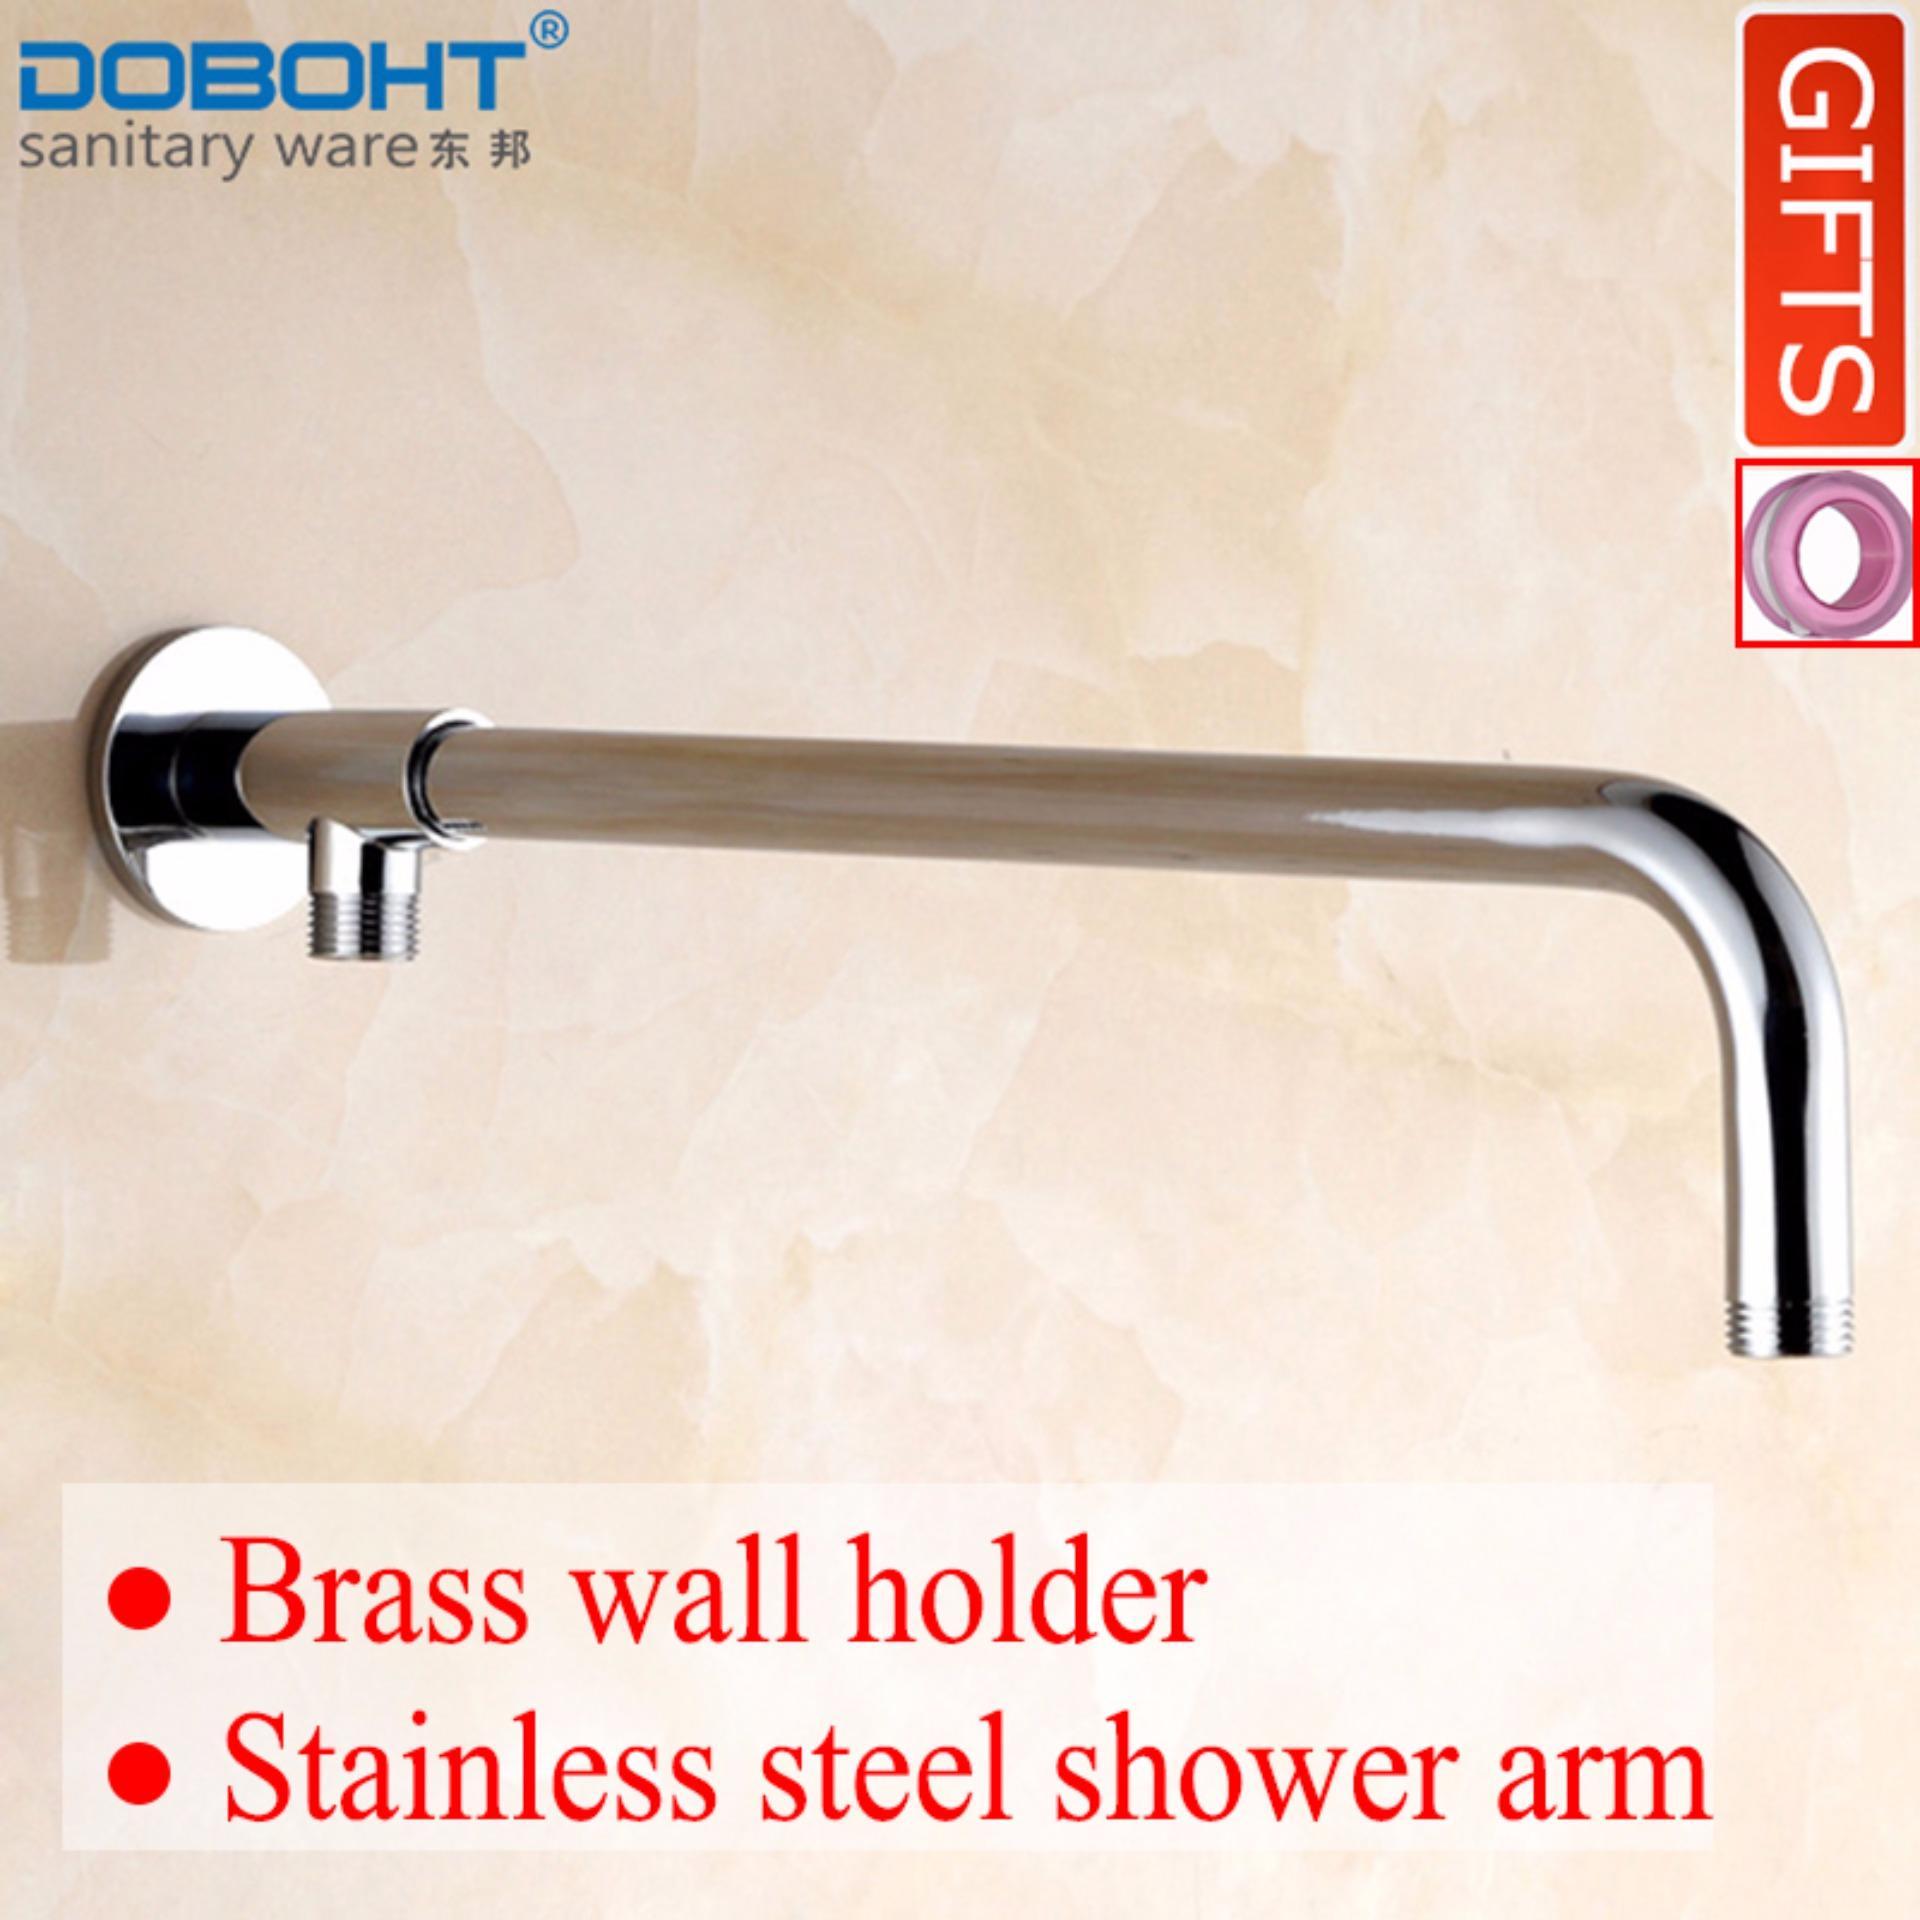 Sale Doboht Stainless Steel Bathroom Home 40Cm Shower Head Arms Chrome Export Doboht Original